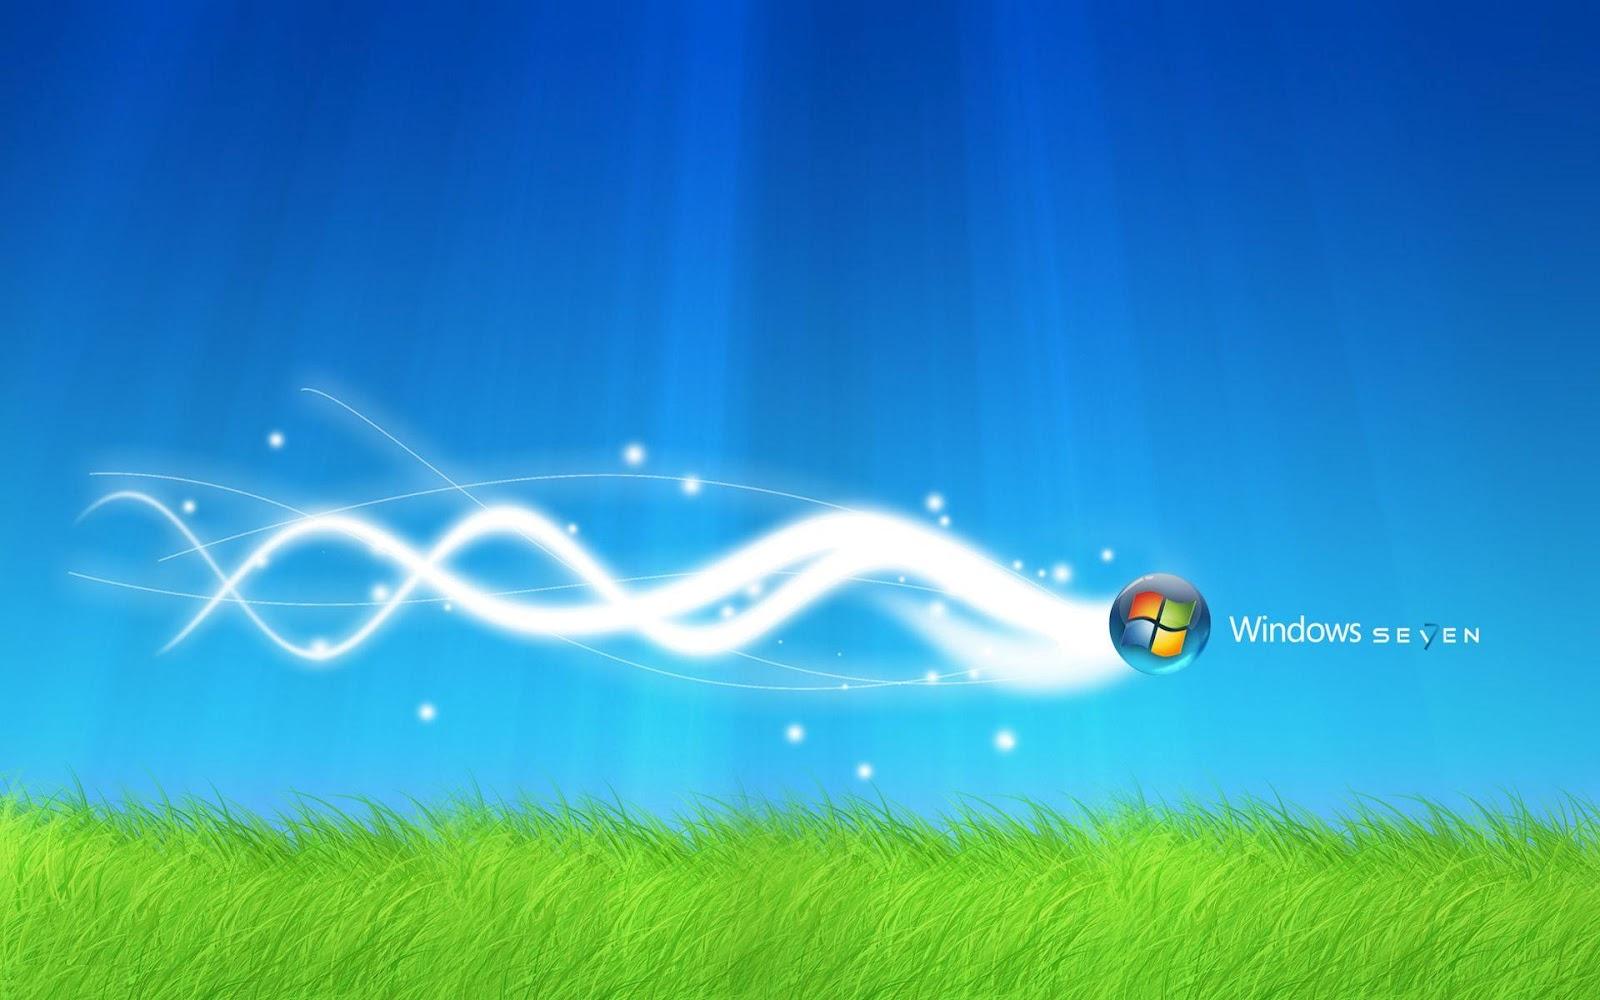 49] Backgrounds For Windows 7 on WallpaperSafari 1600x1000